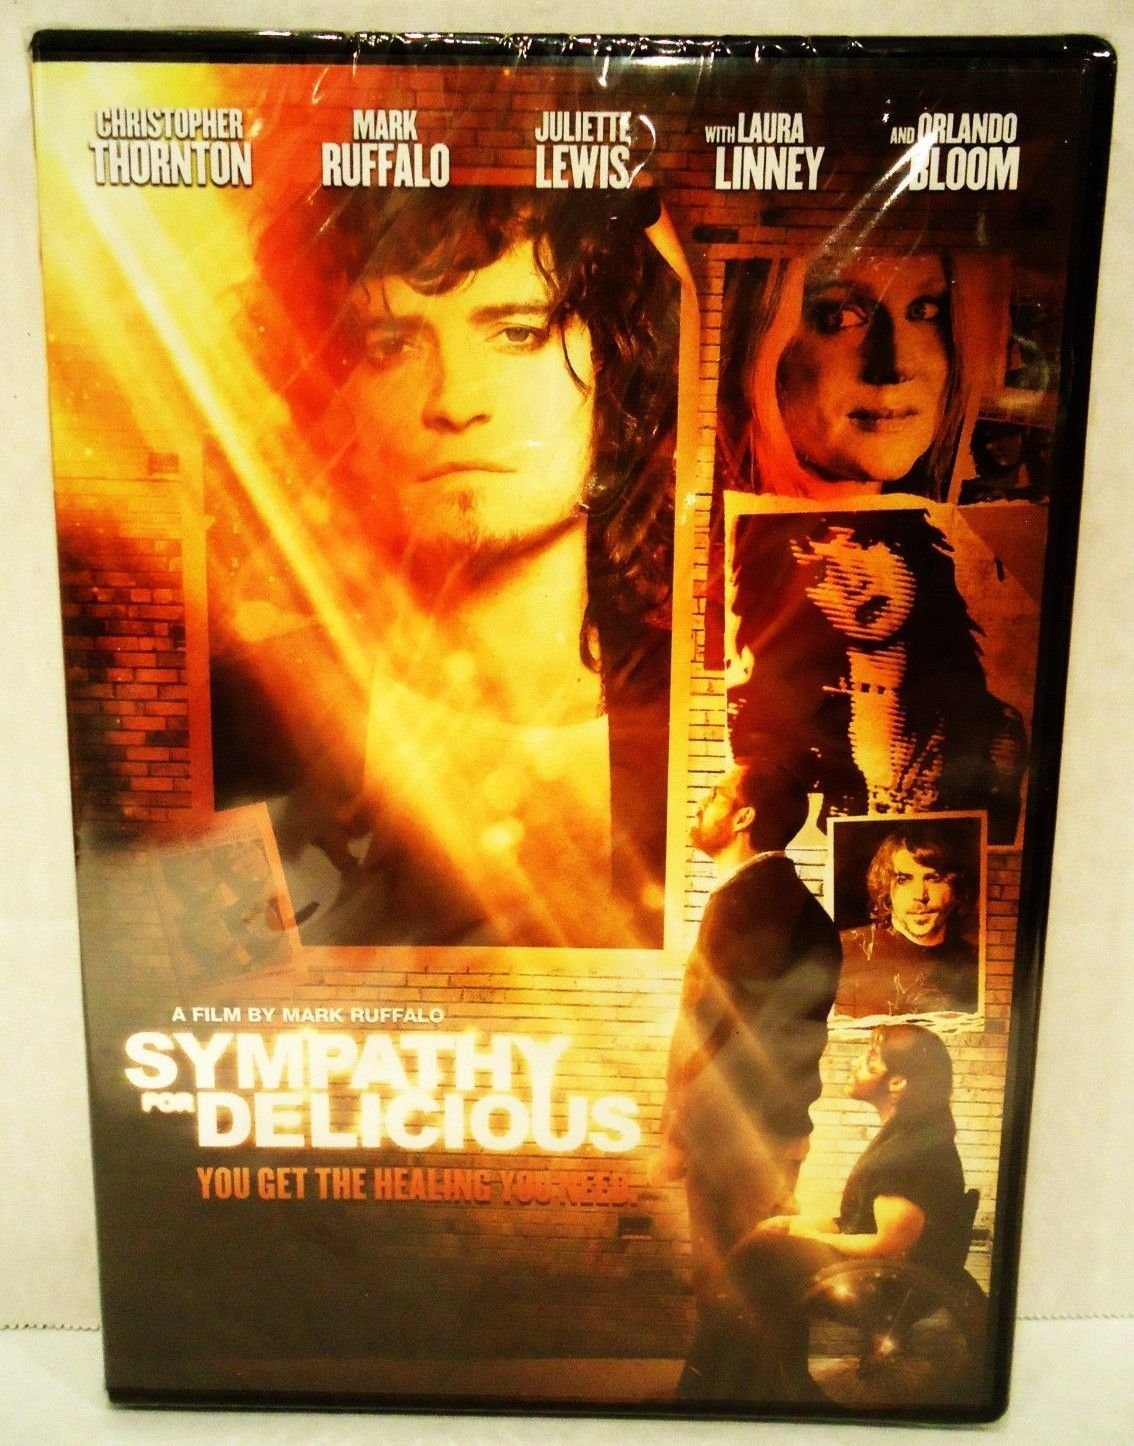 SYMPATHY FOR DELICIOUS - DVD - ORLANDO BLOOM - JULIETTE LEWIS - NEW - DRAMA